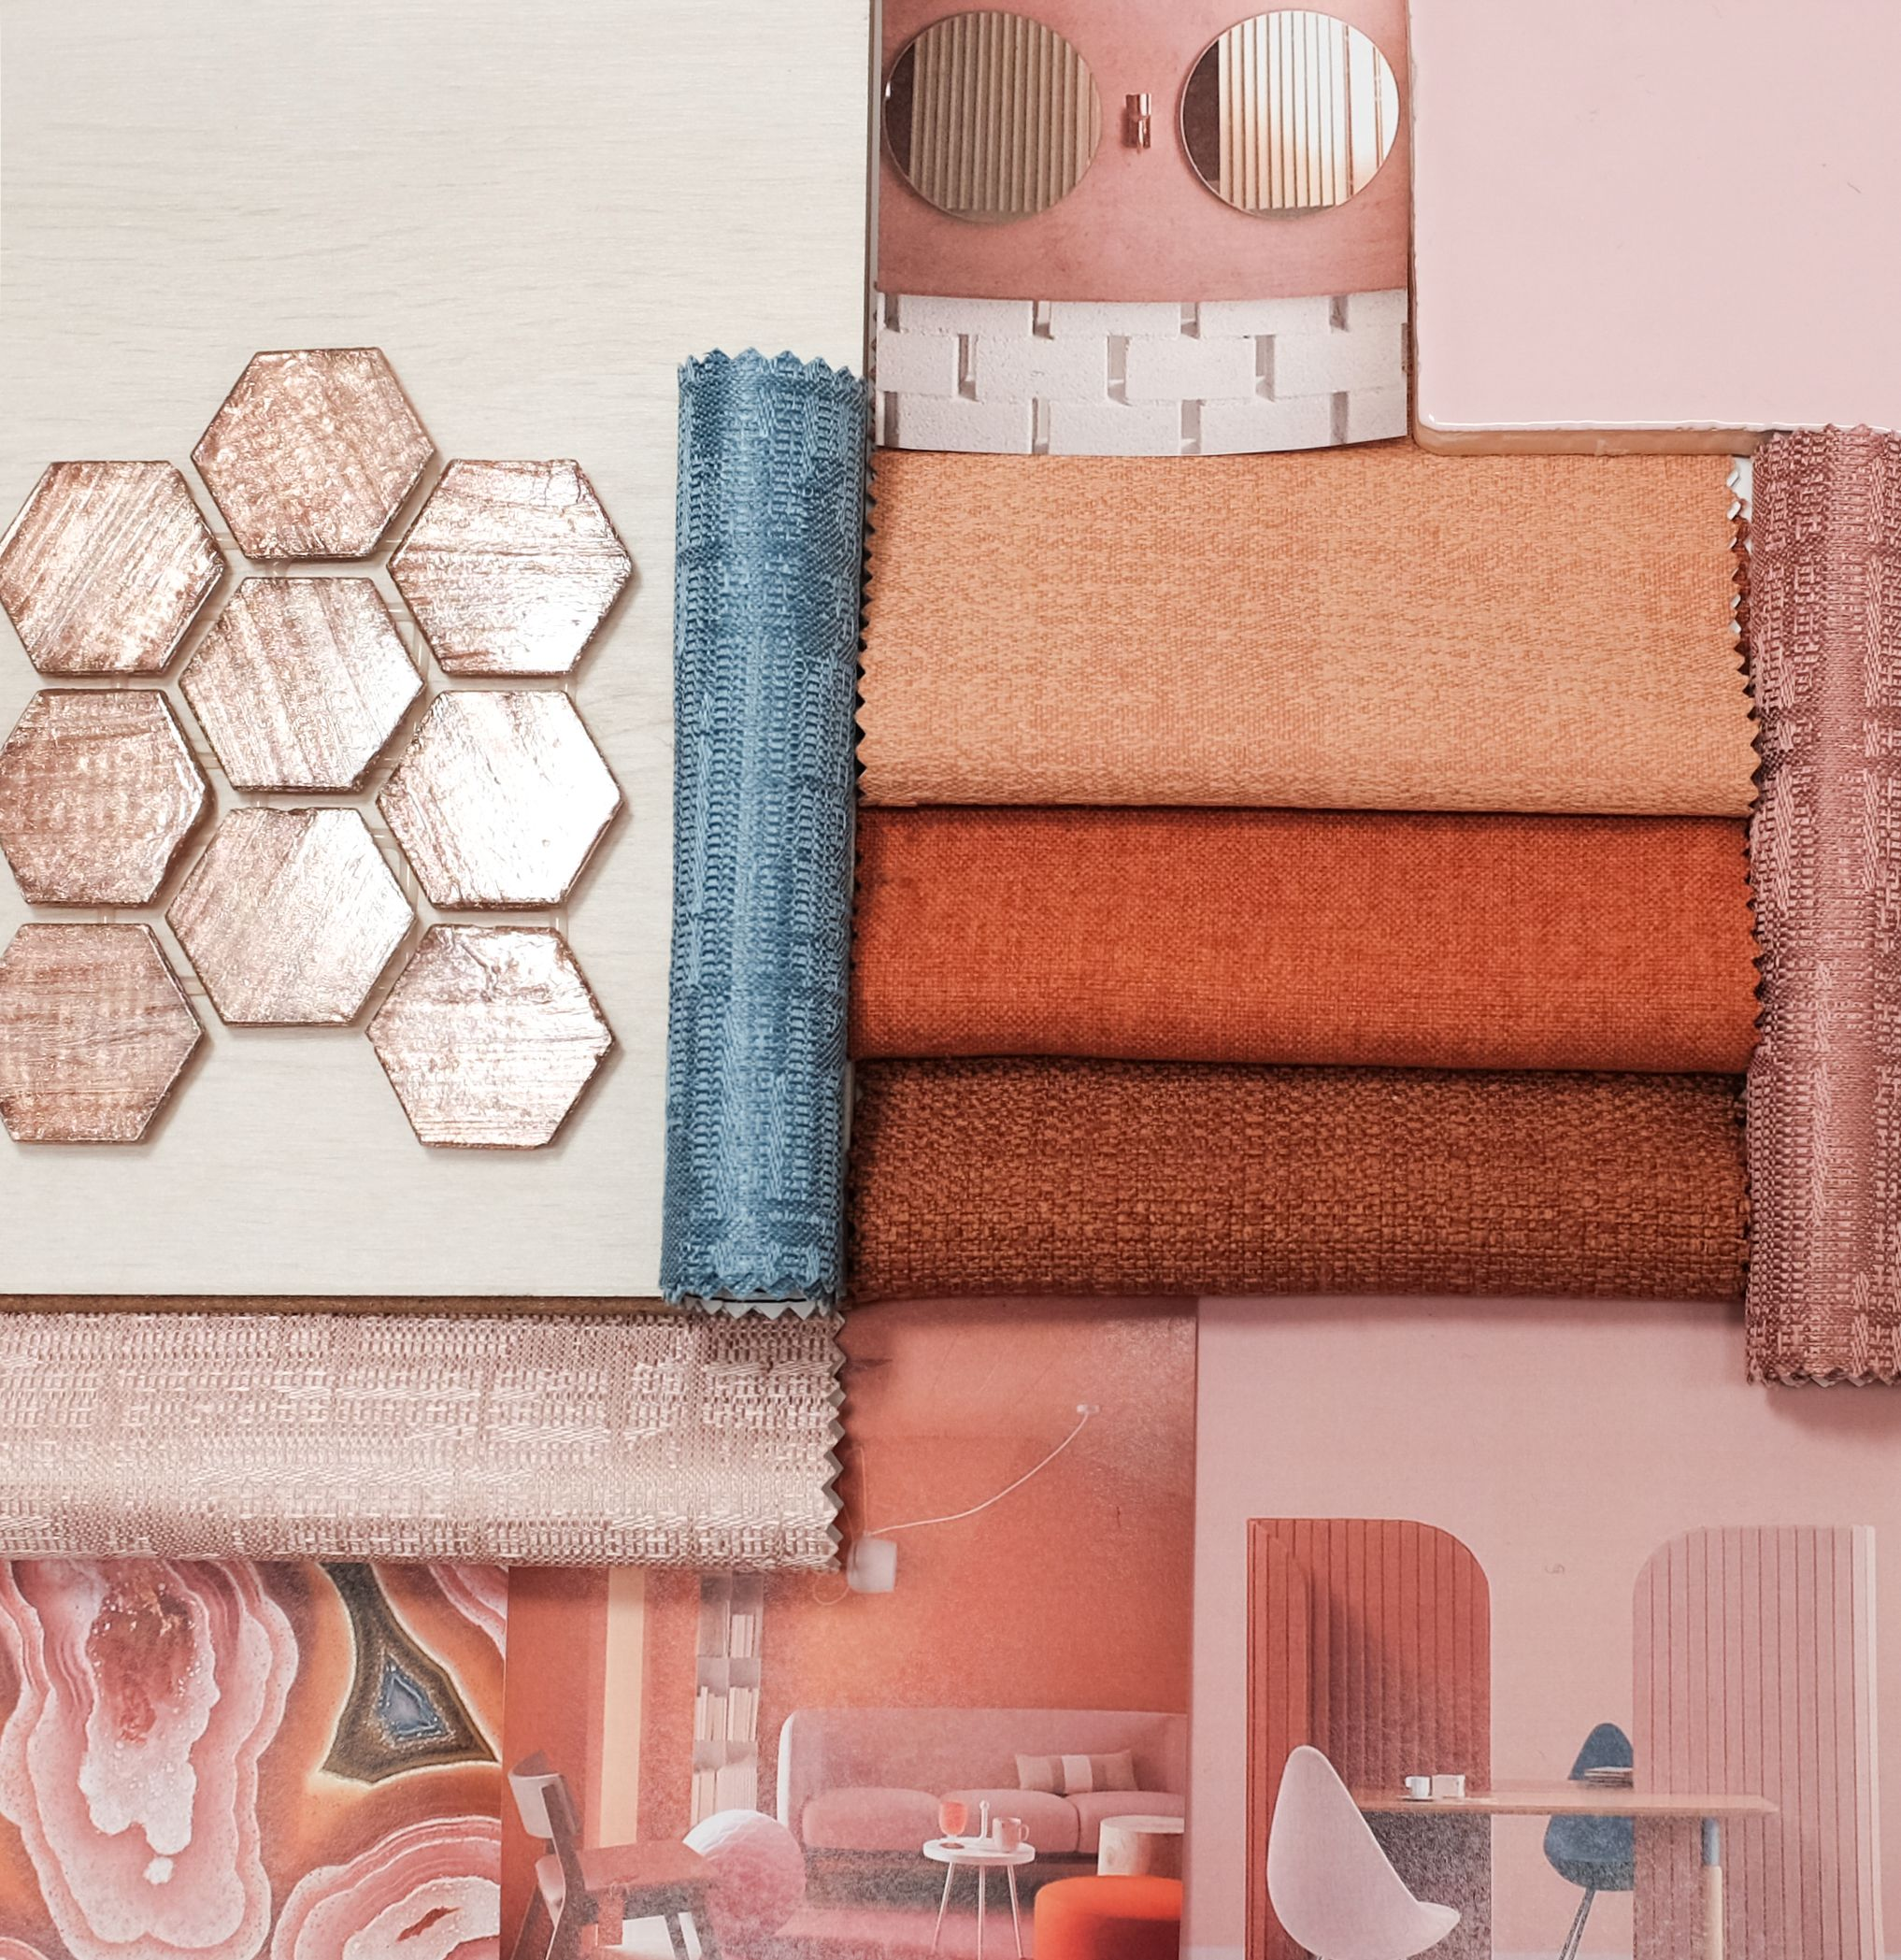 Wilson Fabrics Drapery Moodboard Textile Textiles Fabric Curtains Moodboard Flatlay Fabric Photography Interior Design Mood Board Buy Fabric Online